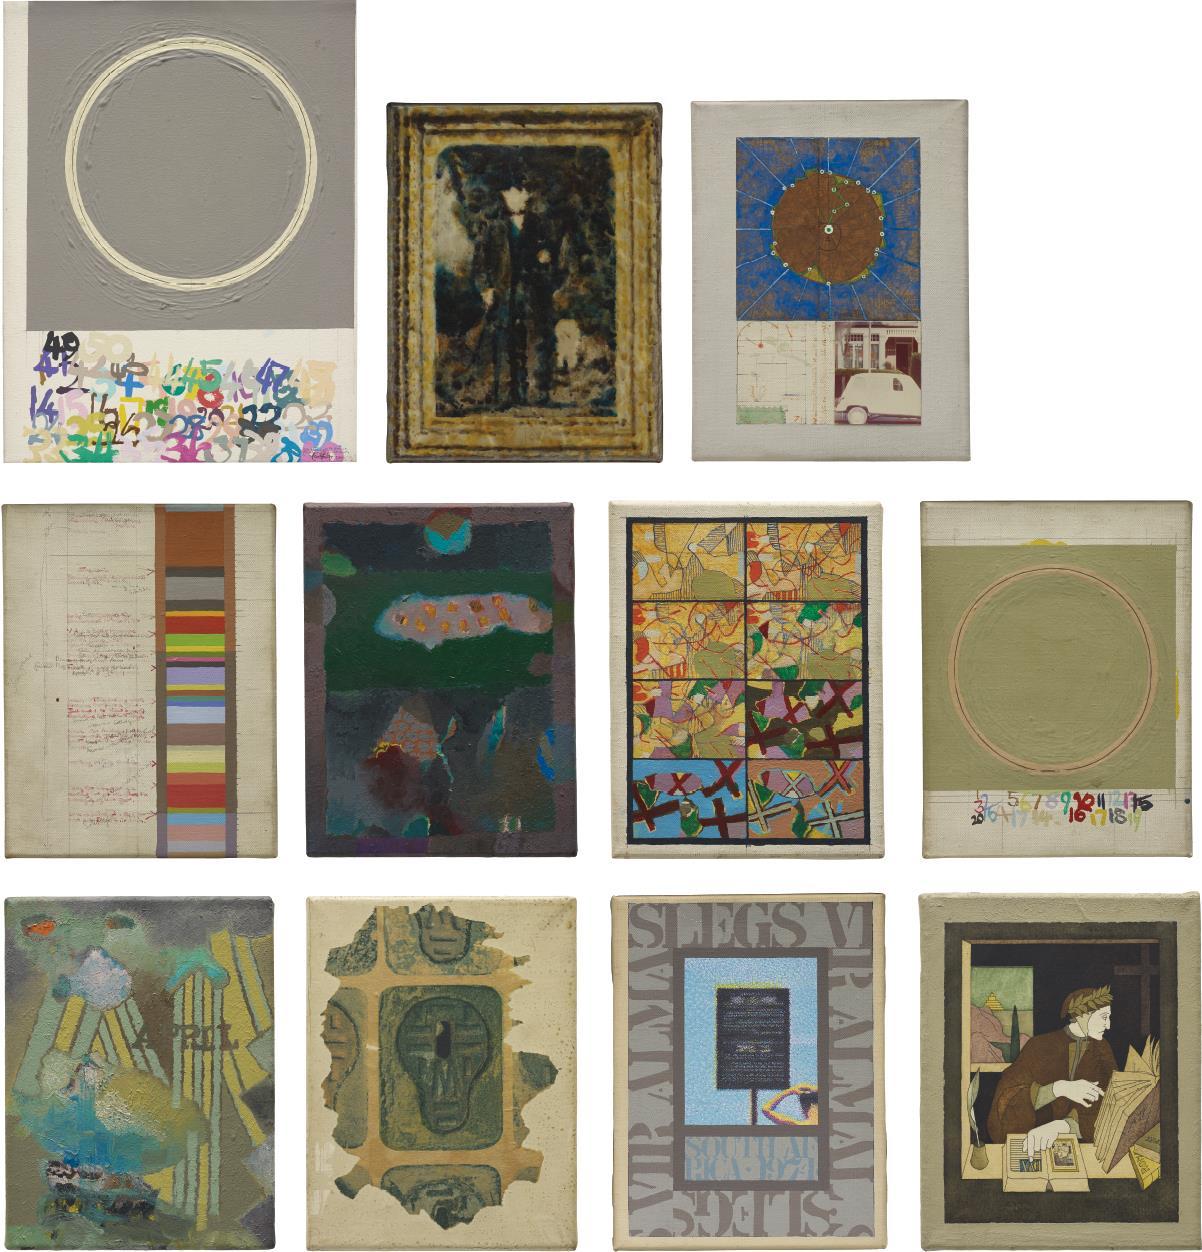 Tom Phillips-11 Studies-1970